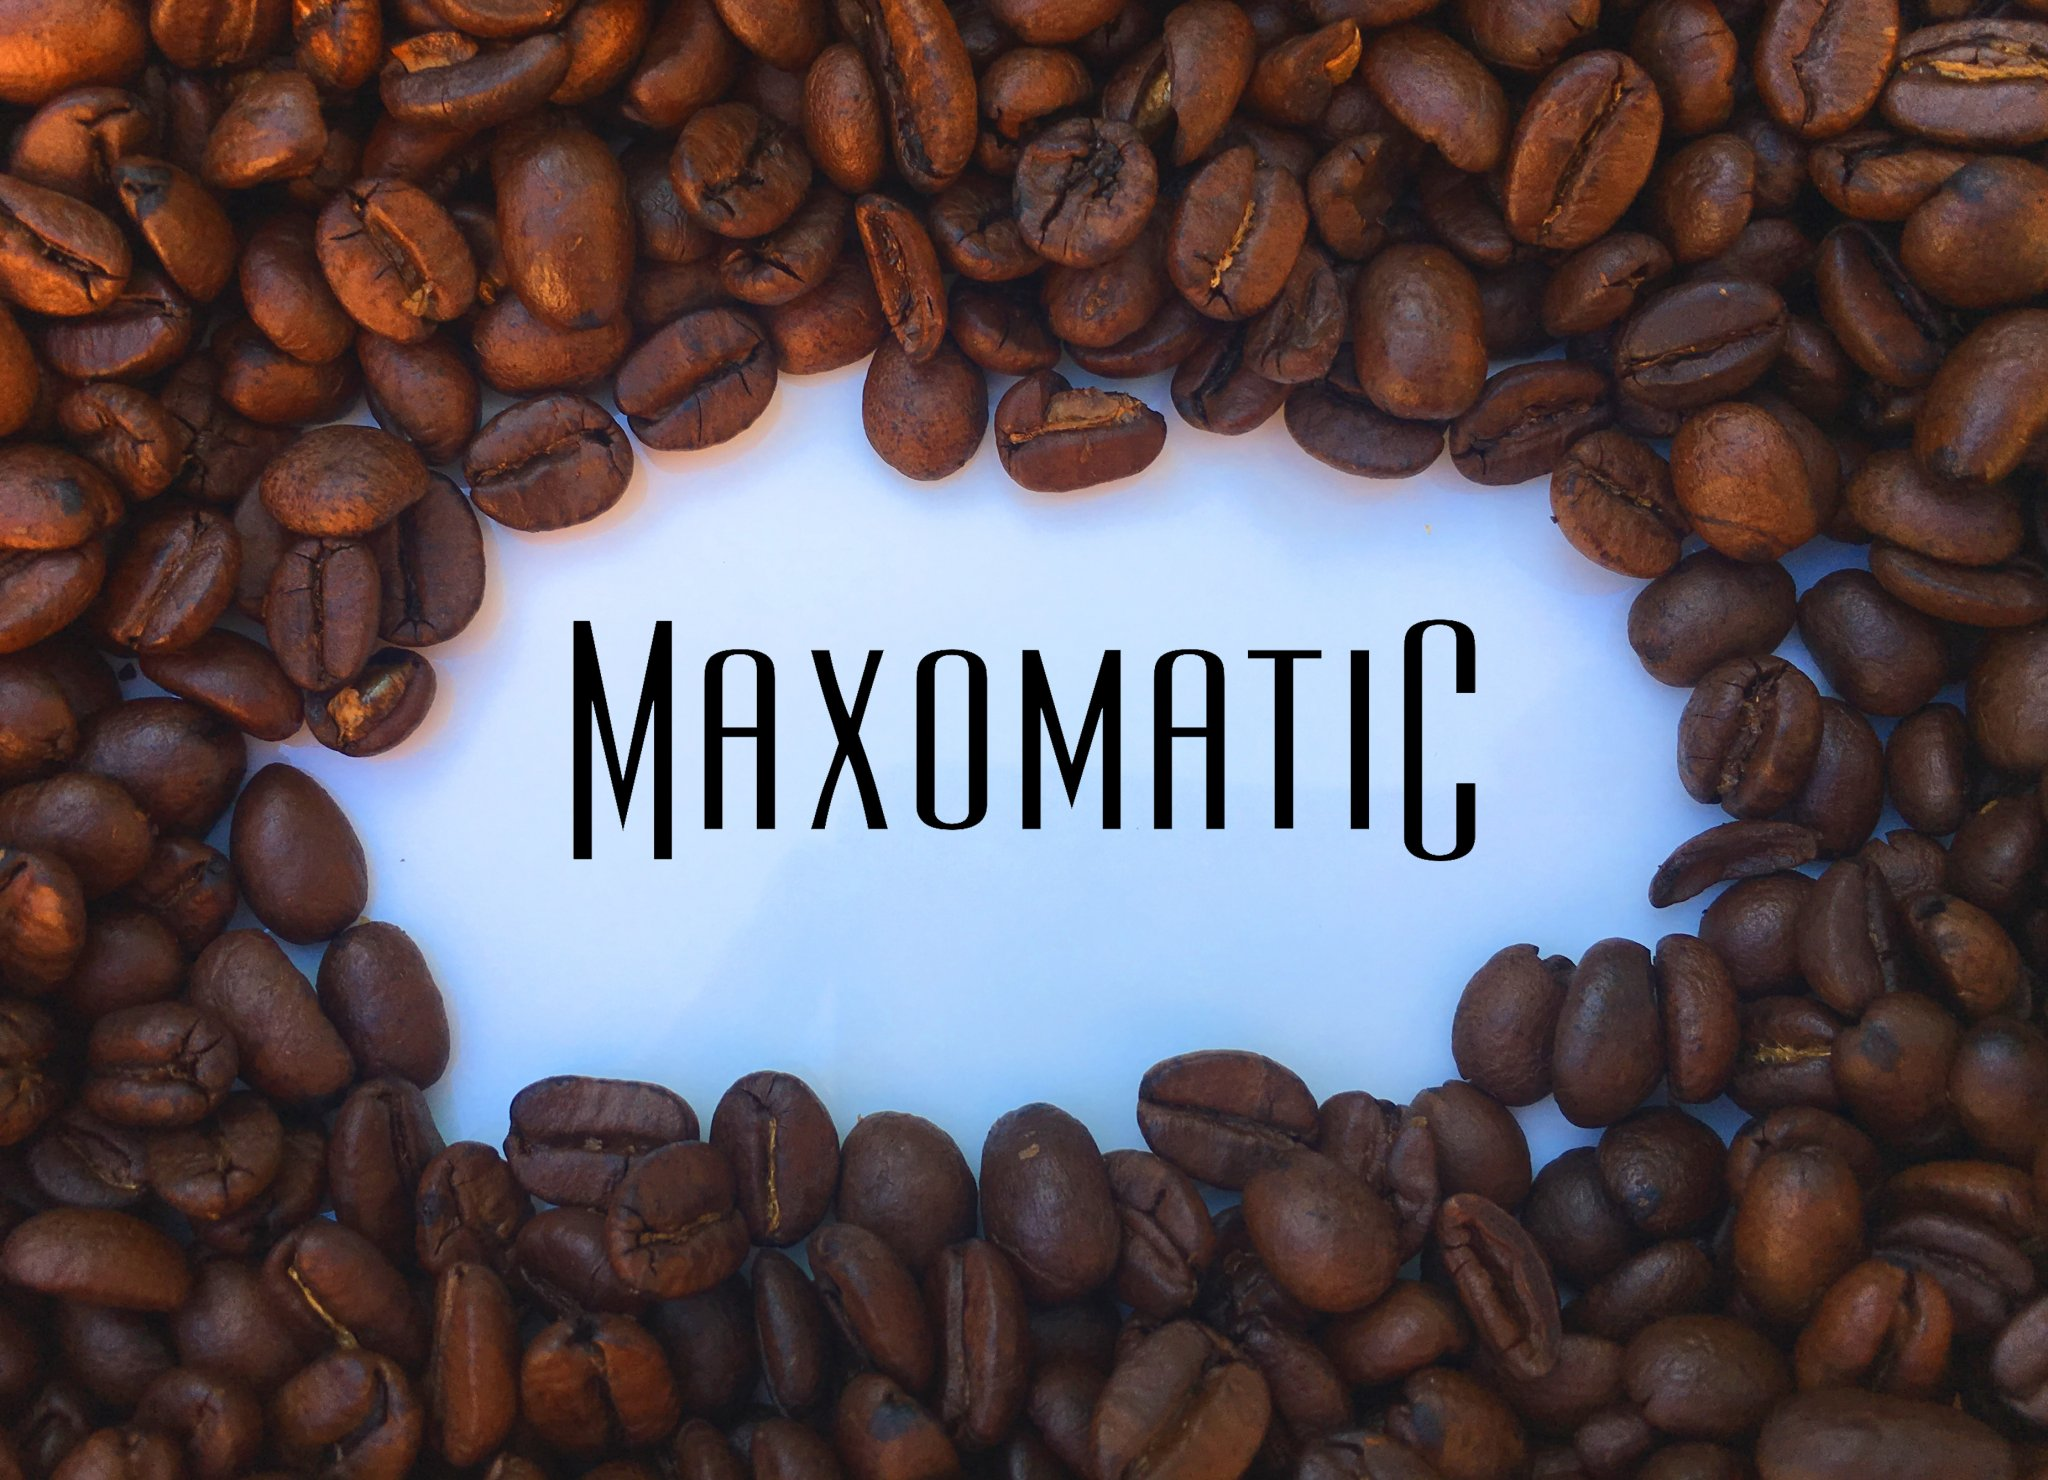 Kaffeeautomaten, Kaltgetränke, Warenvertriebsautomaten